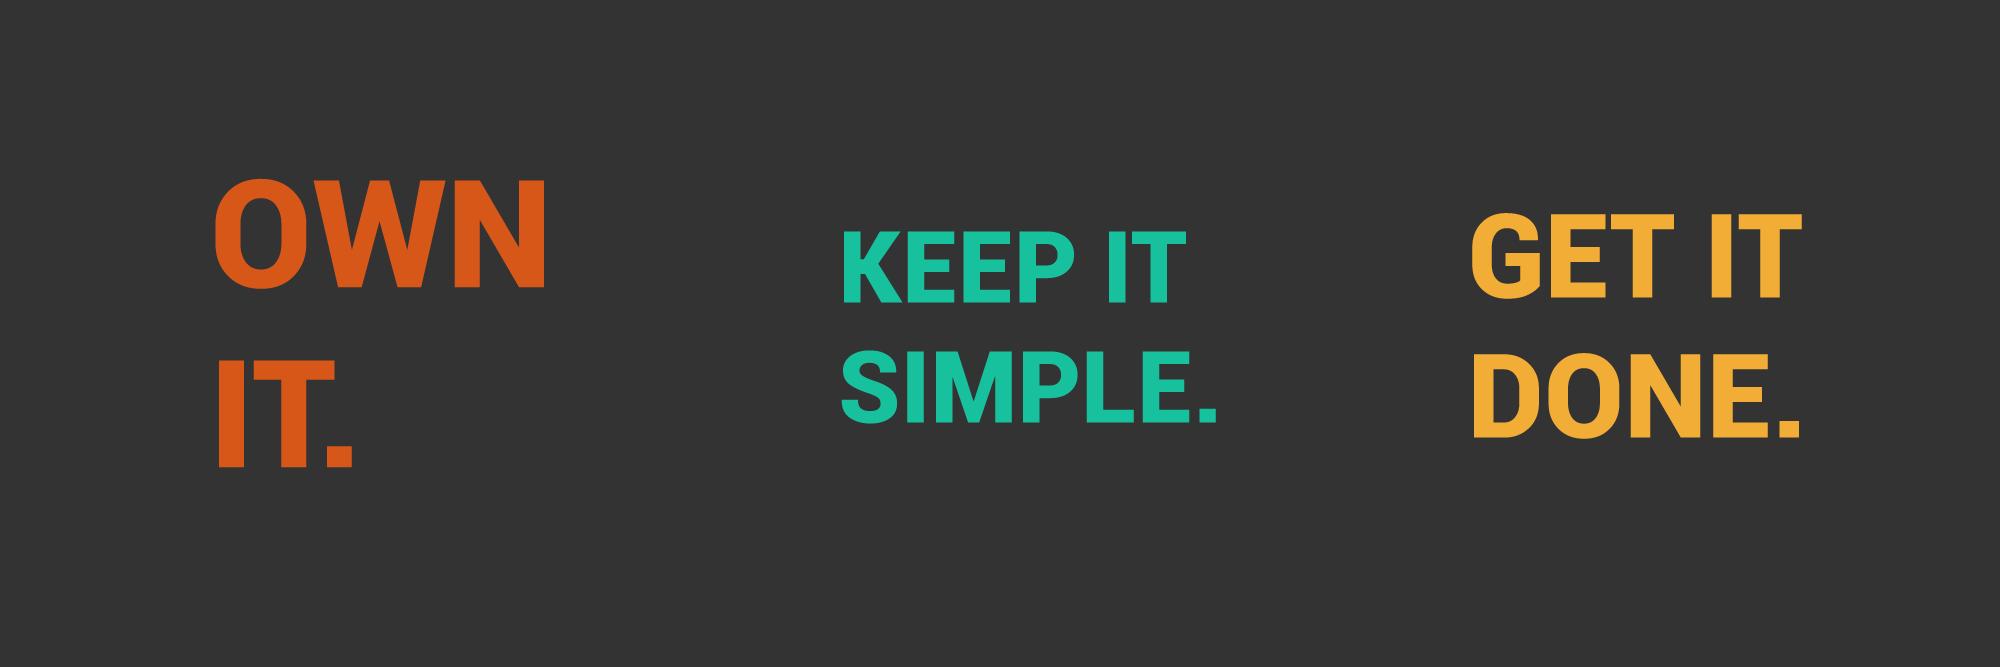 operating-principles-blog-01